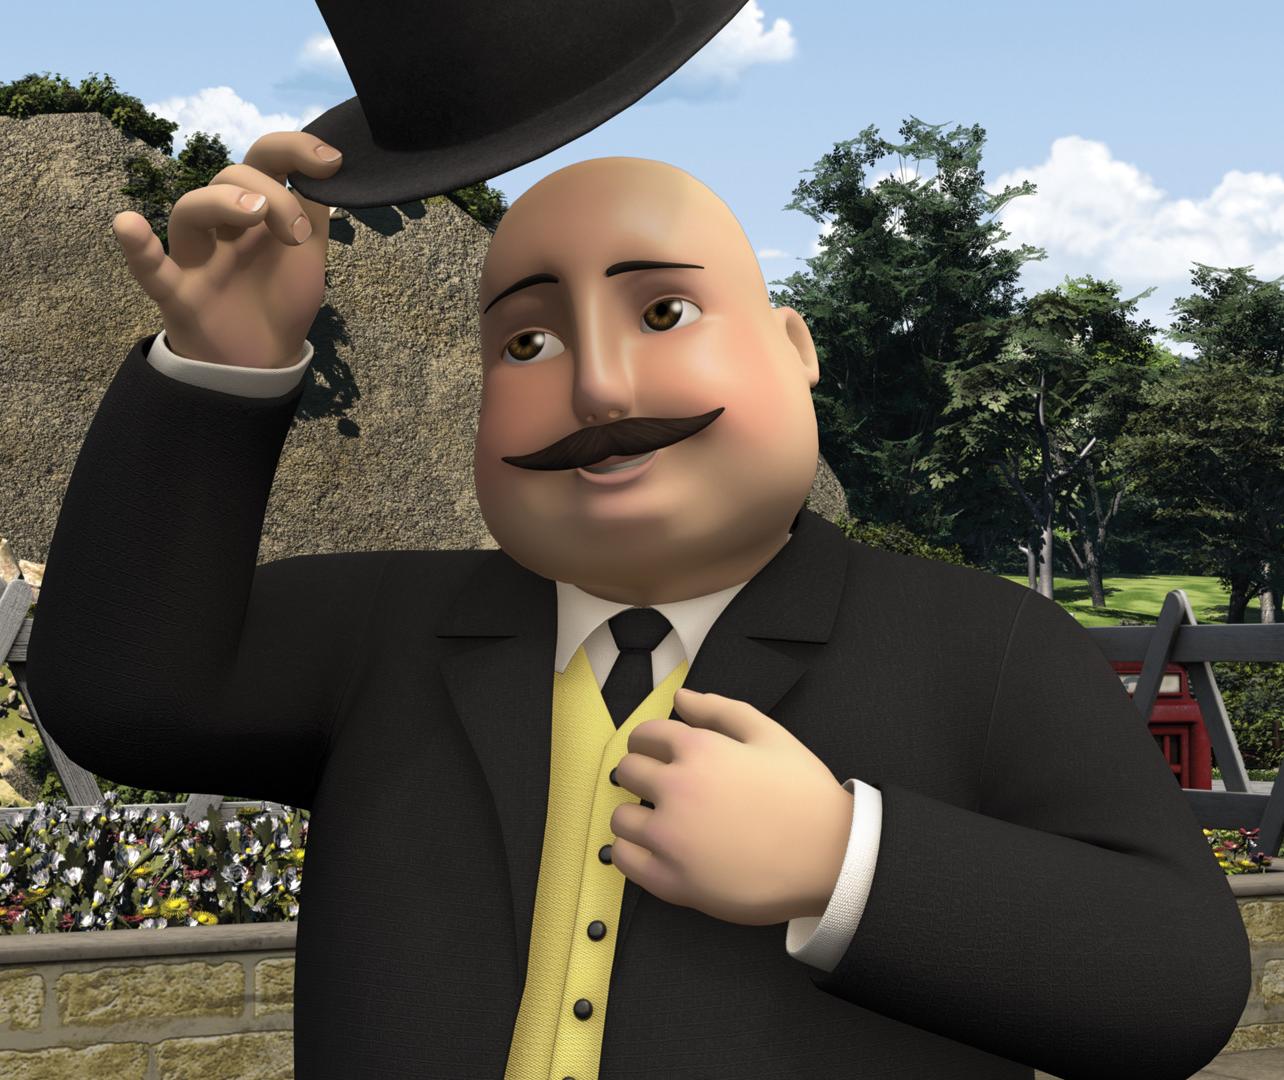 Sir Lowham Hatt